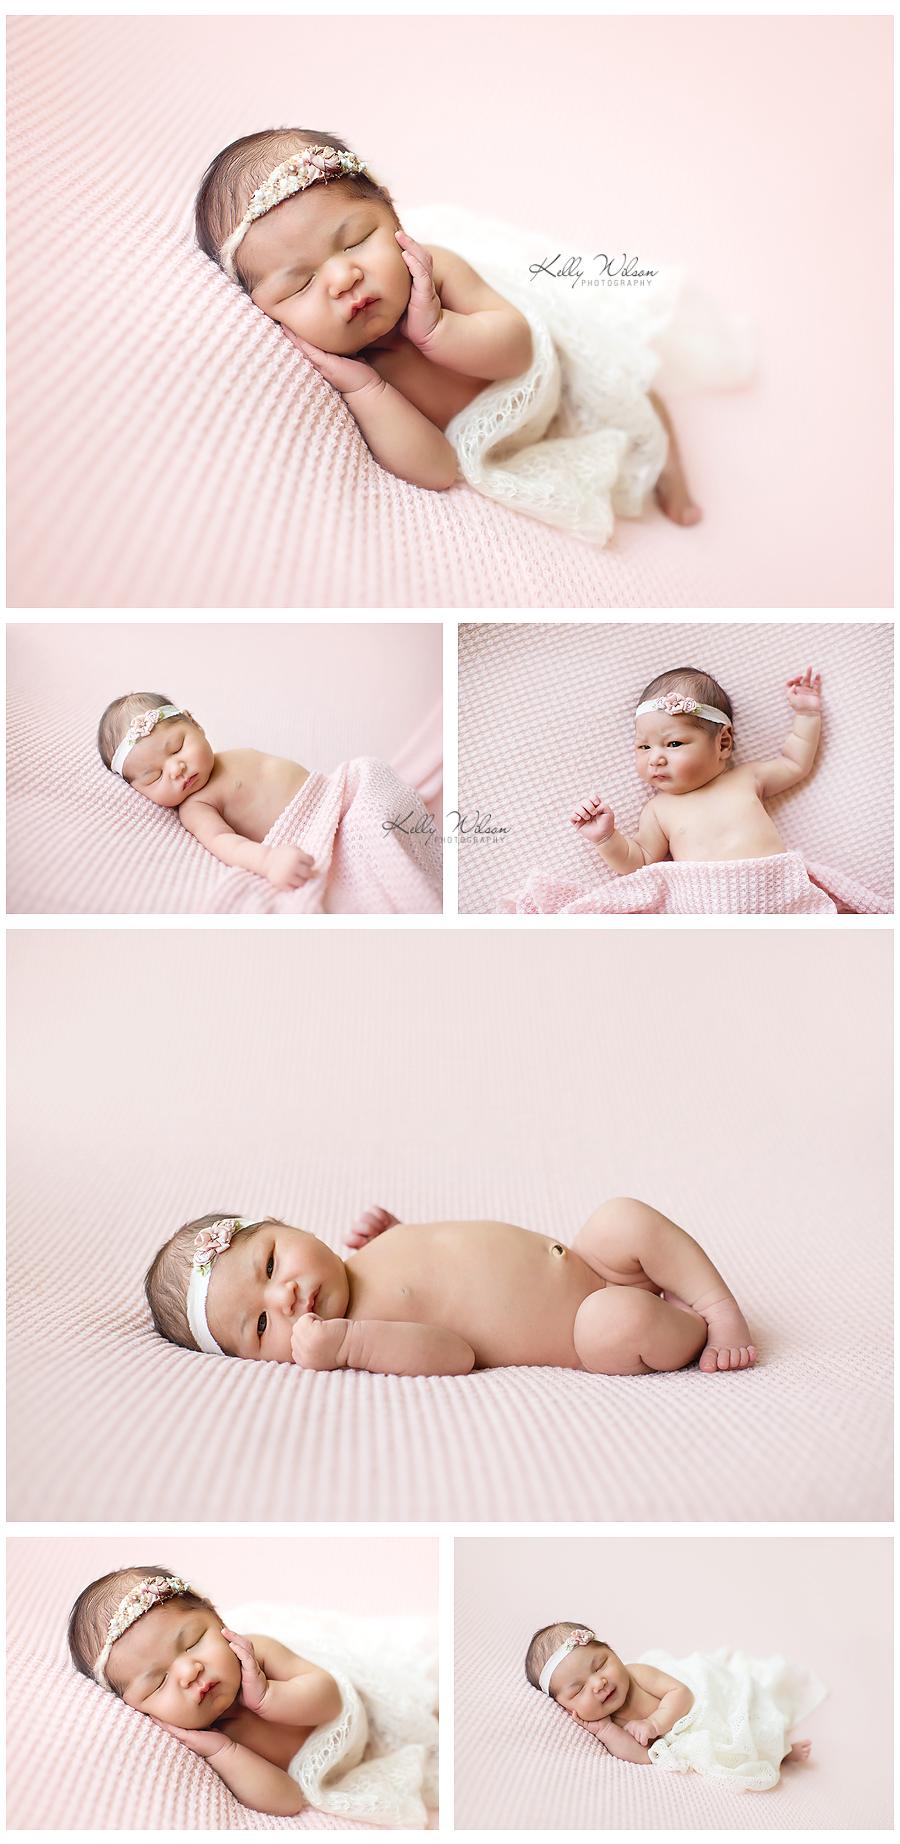 newborn posing examples for newborn photography